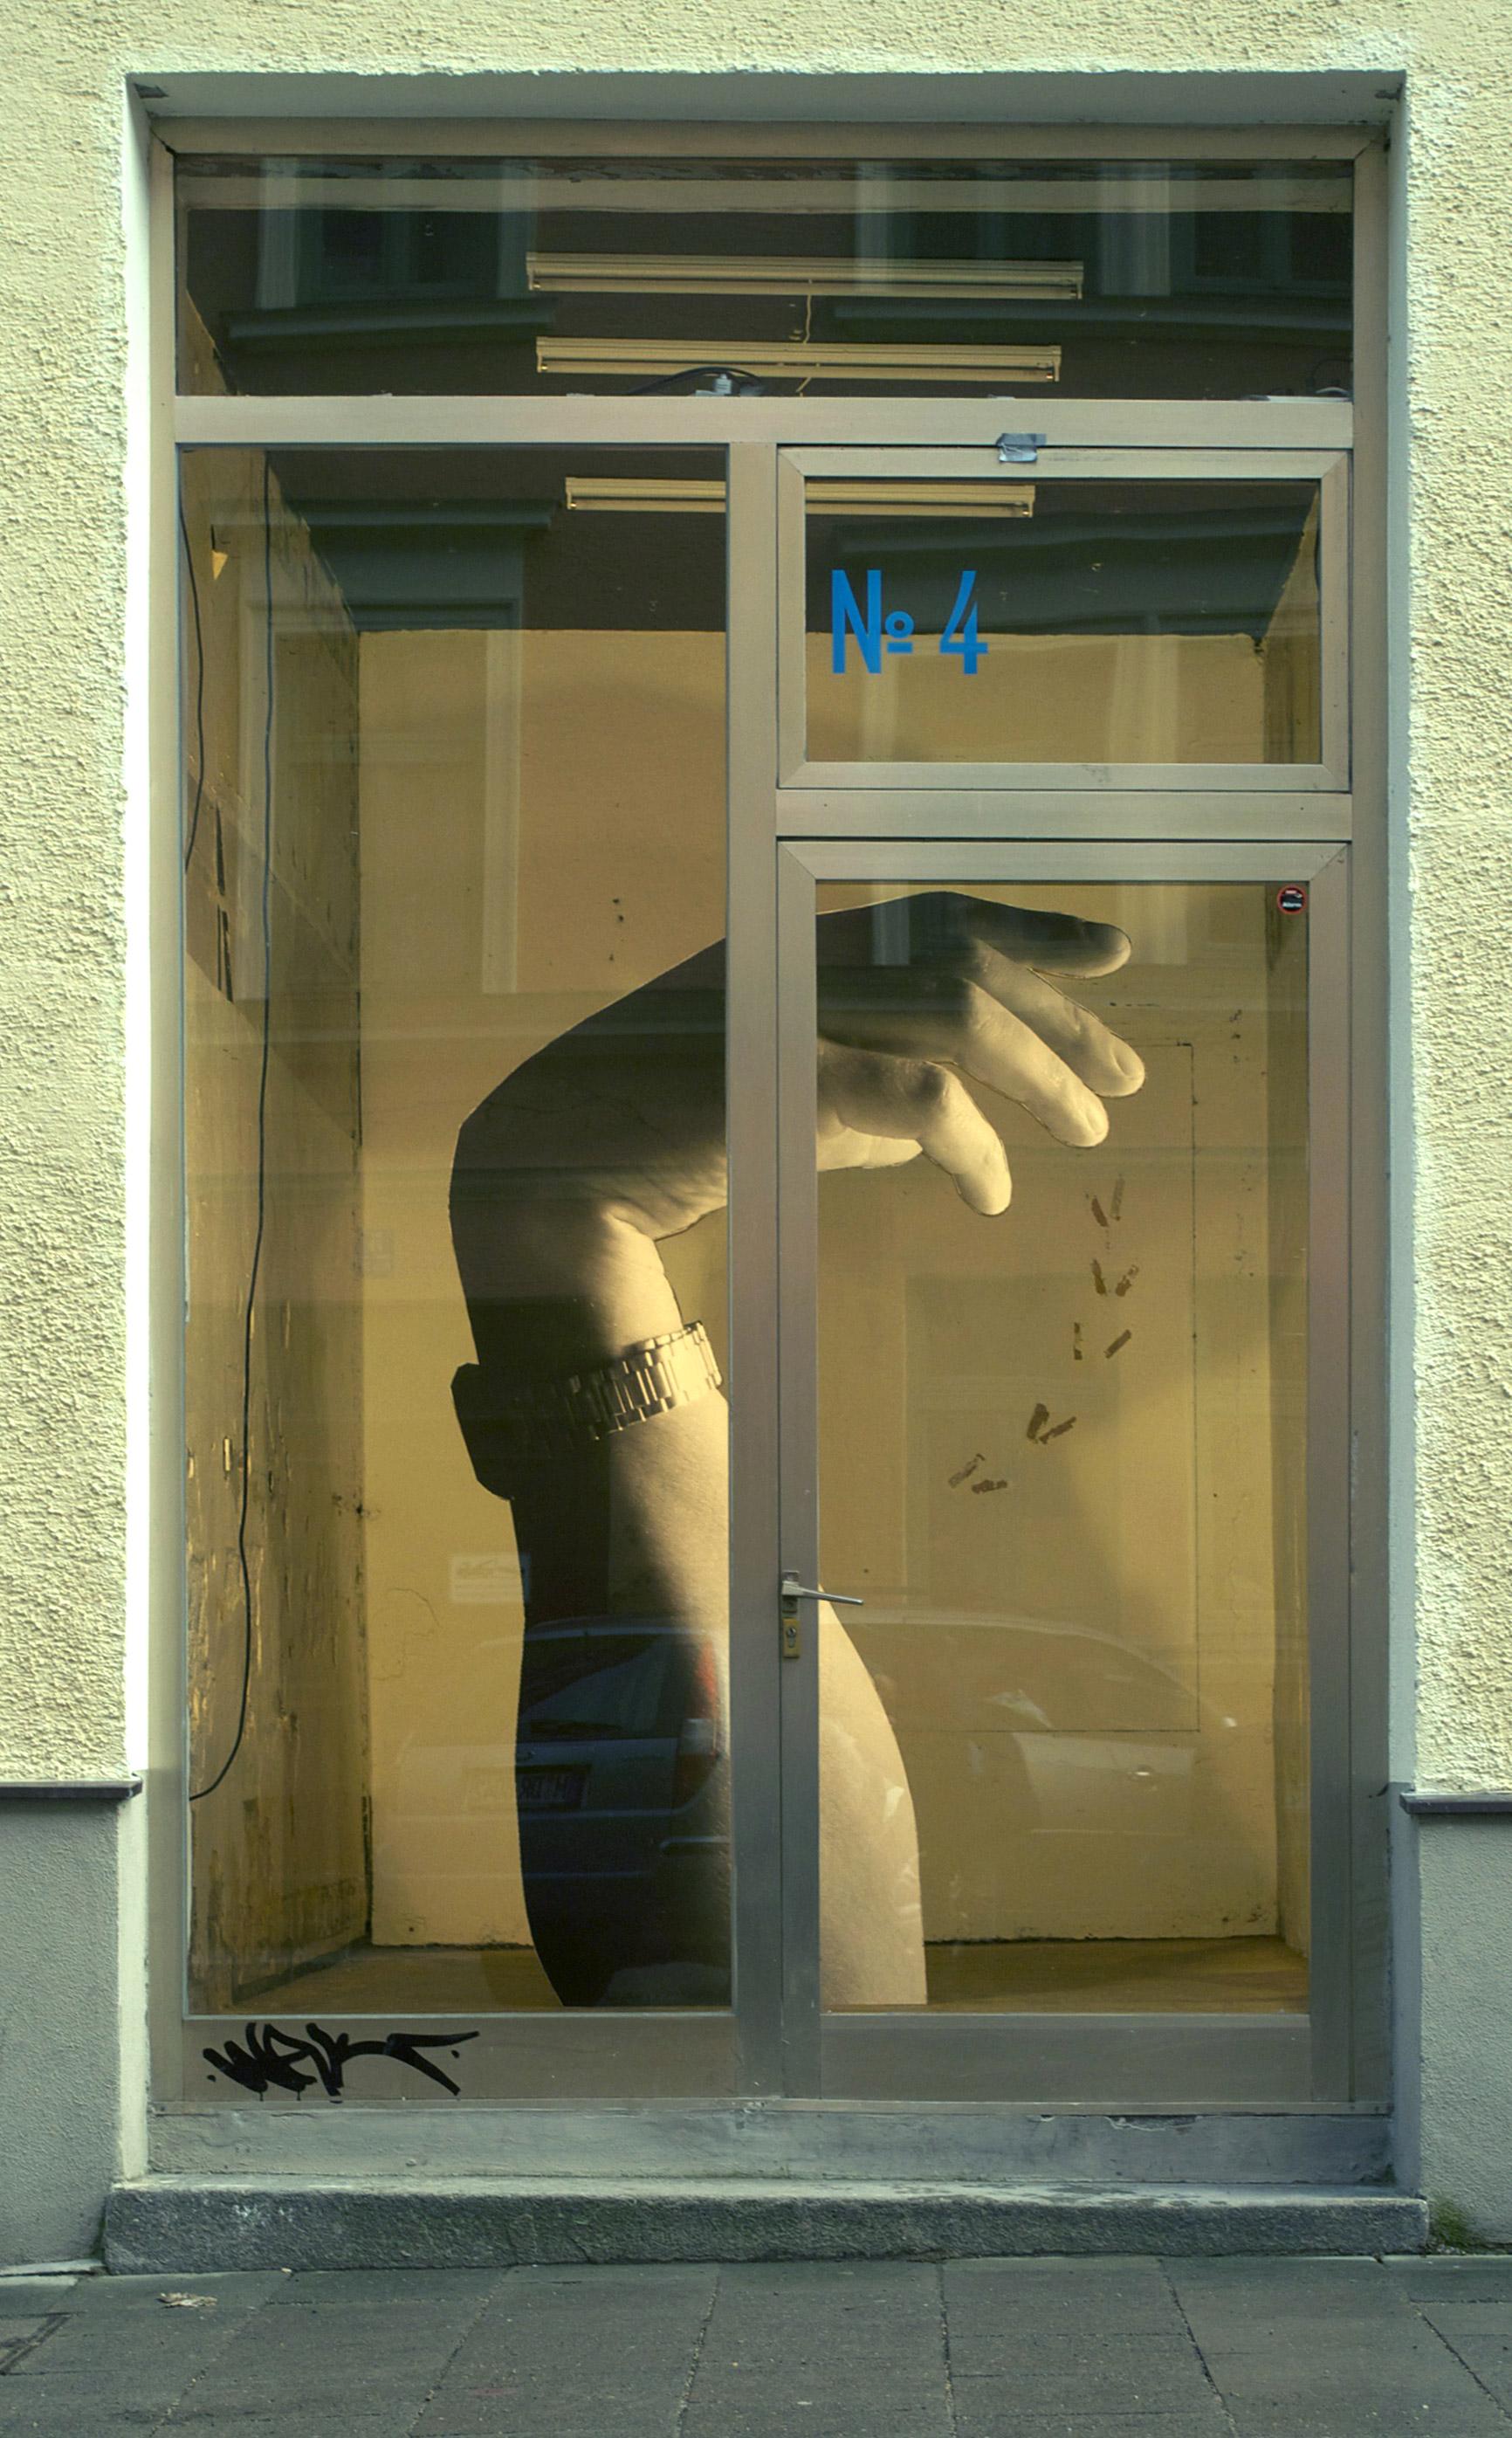 Großzügig 8 X 24 Rahmen Michaels Fotos - Bilderrahmen Ideen - szurop ...